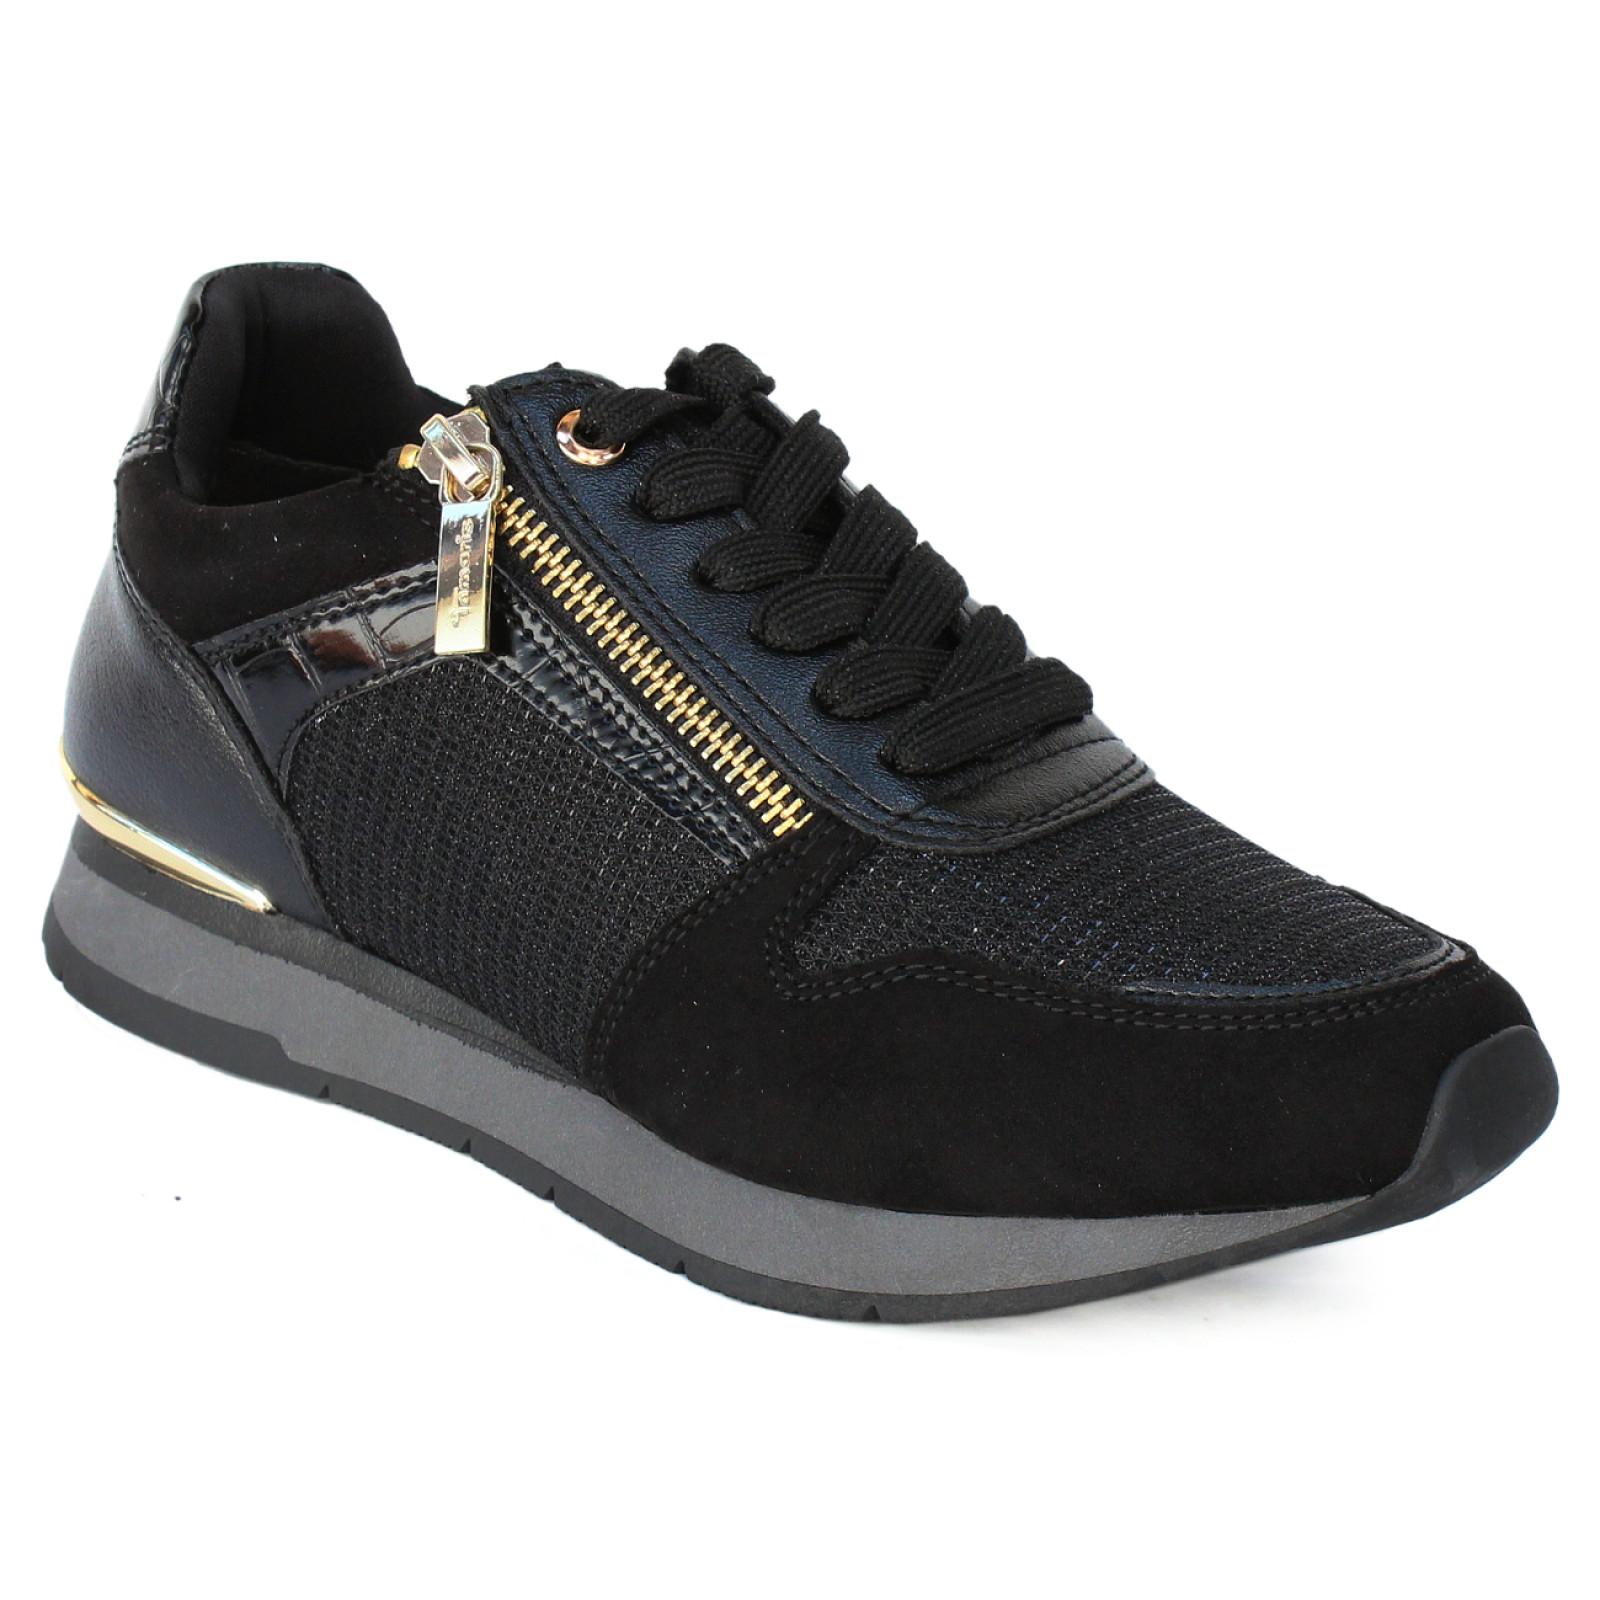 Tamaris női sportos sneaker félcipő 23603 25 048 fekete